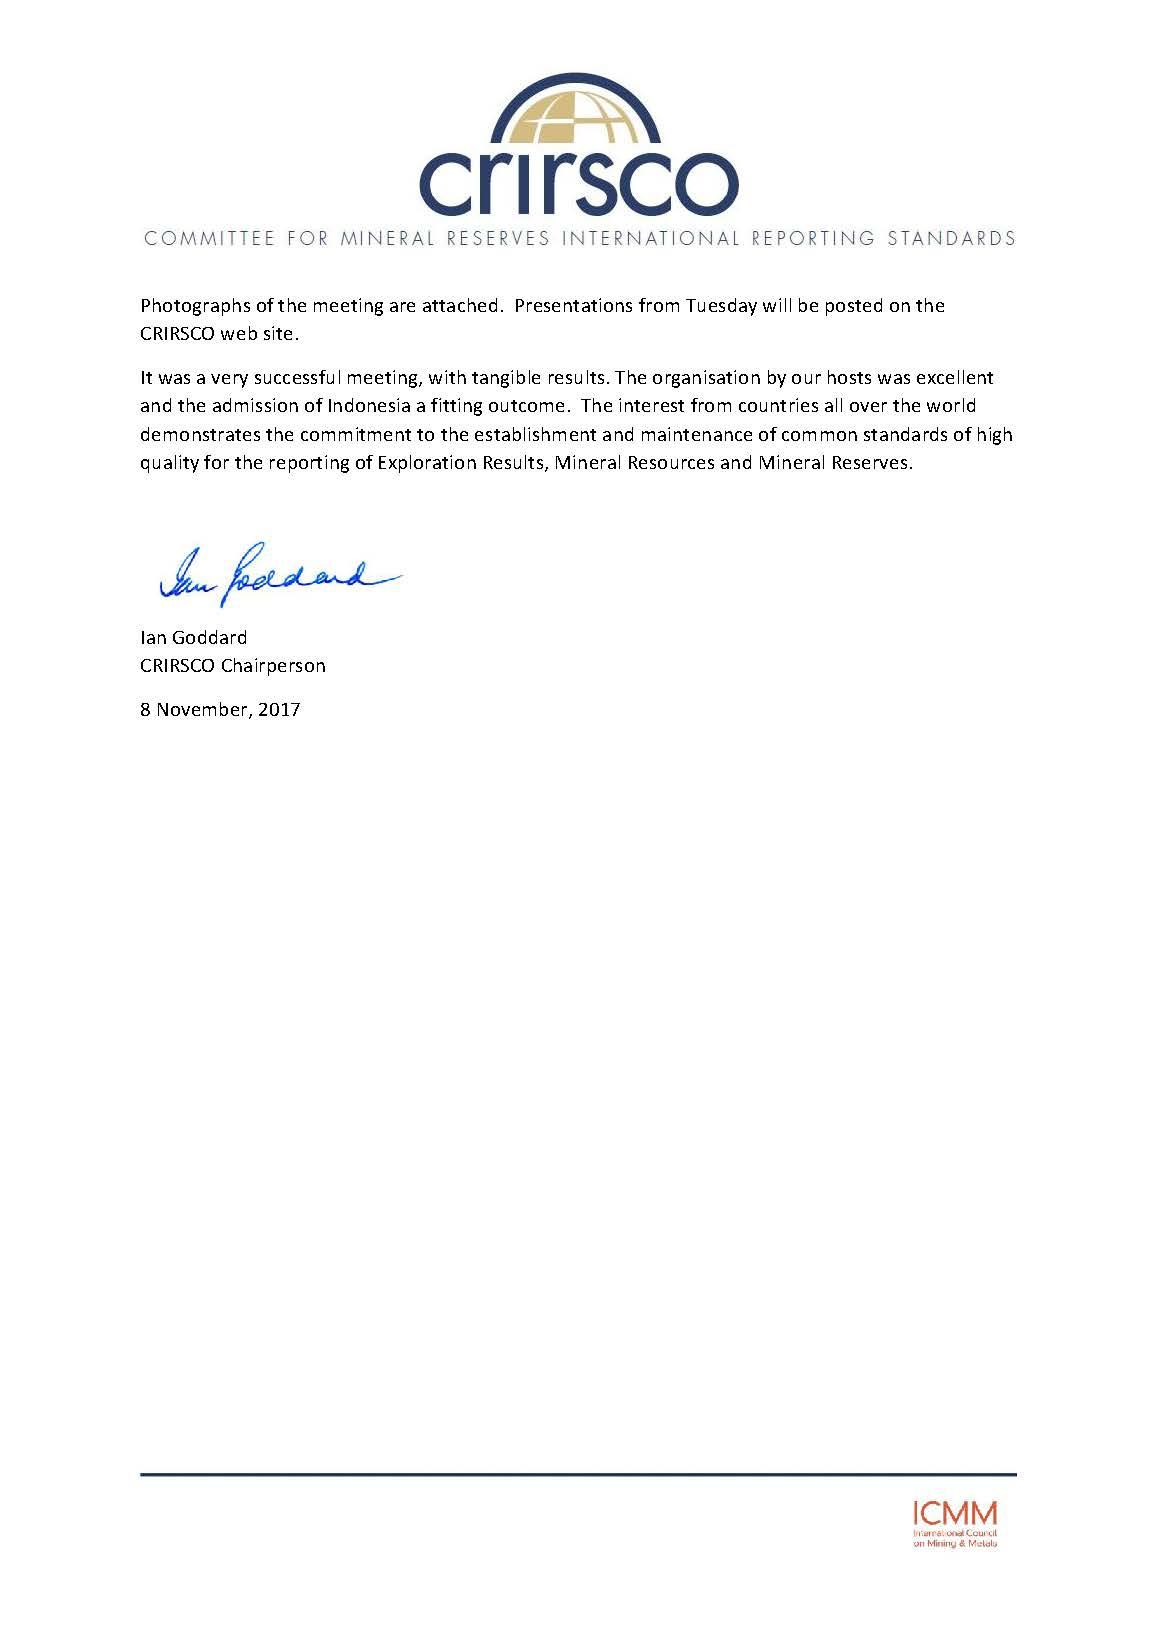 CRIRSCO Release Nov2017_Page_2